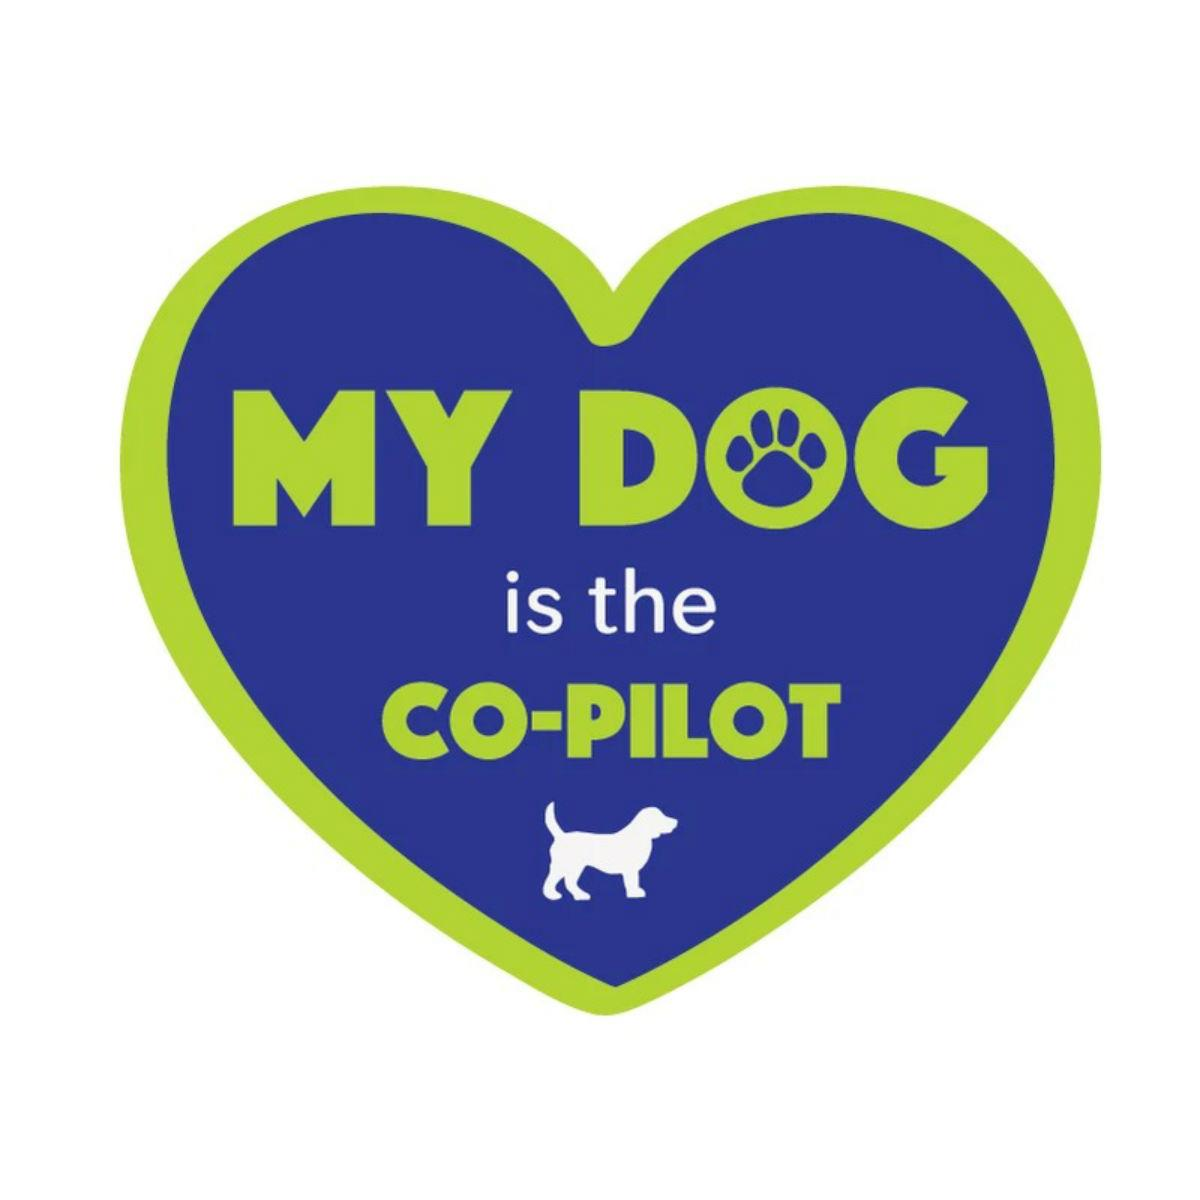 My Dog is the Co-Pilot Sticker by Dog Speak